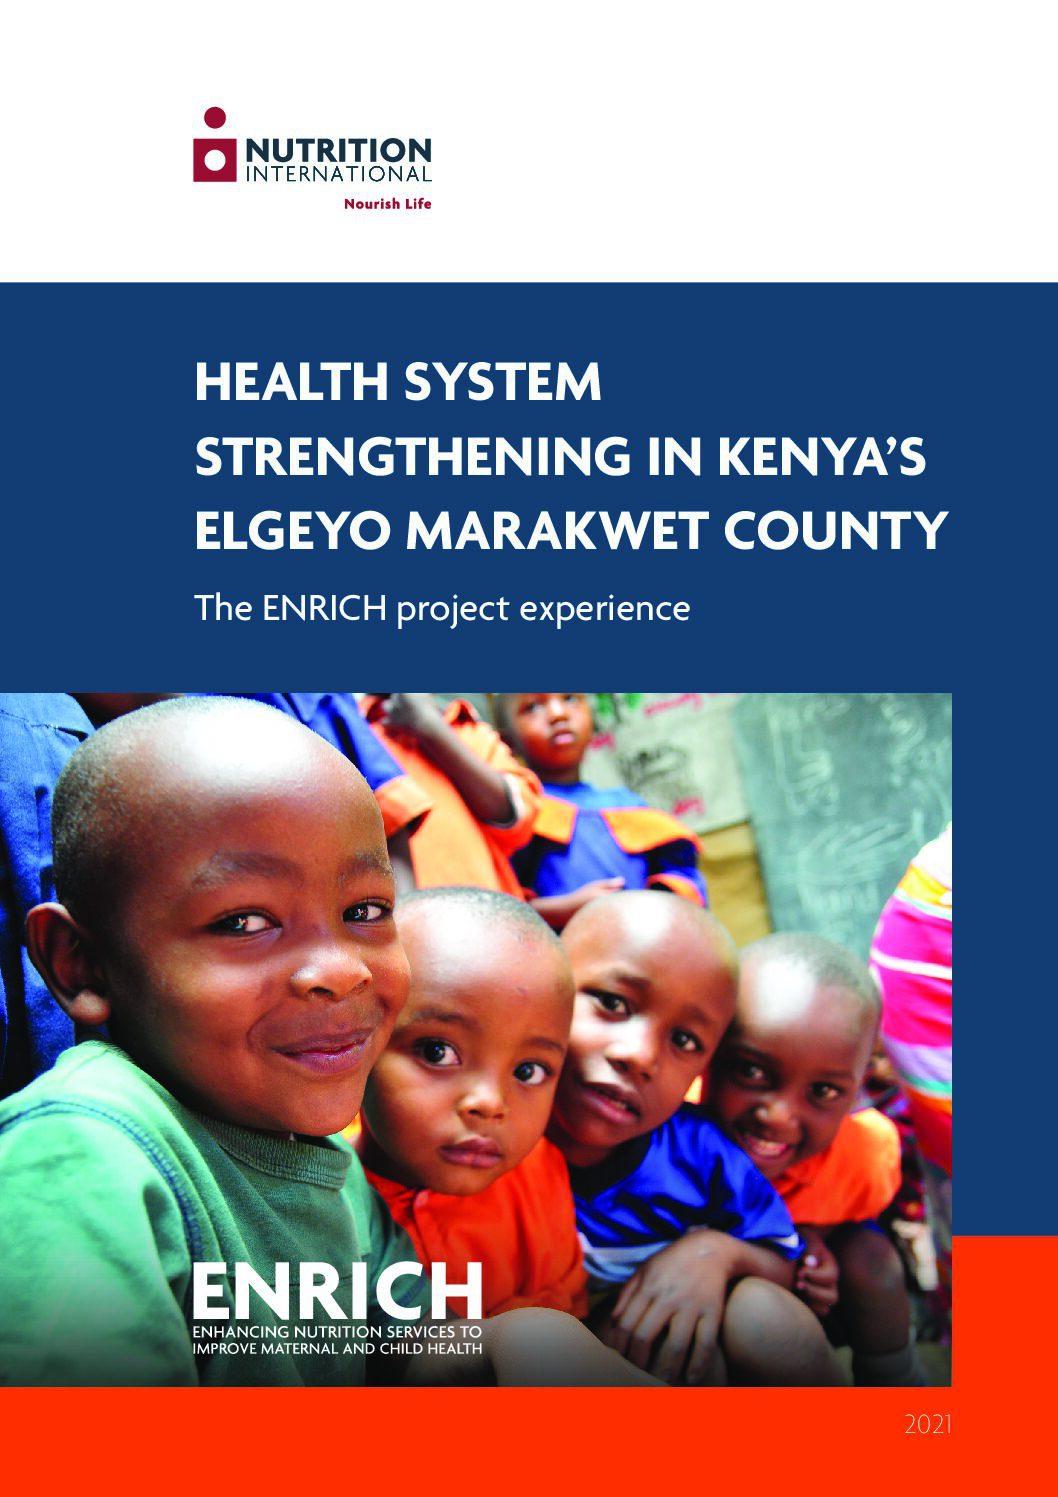 Health System Strengthening in Kenya's Elgeyo Marakwet County thumbnail